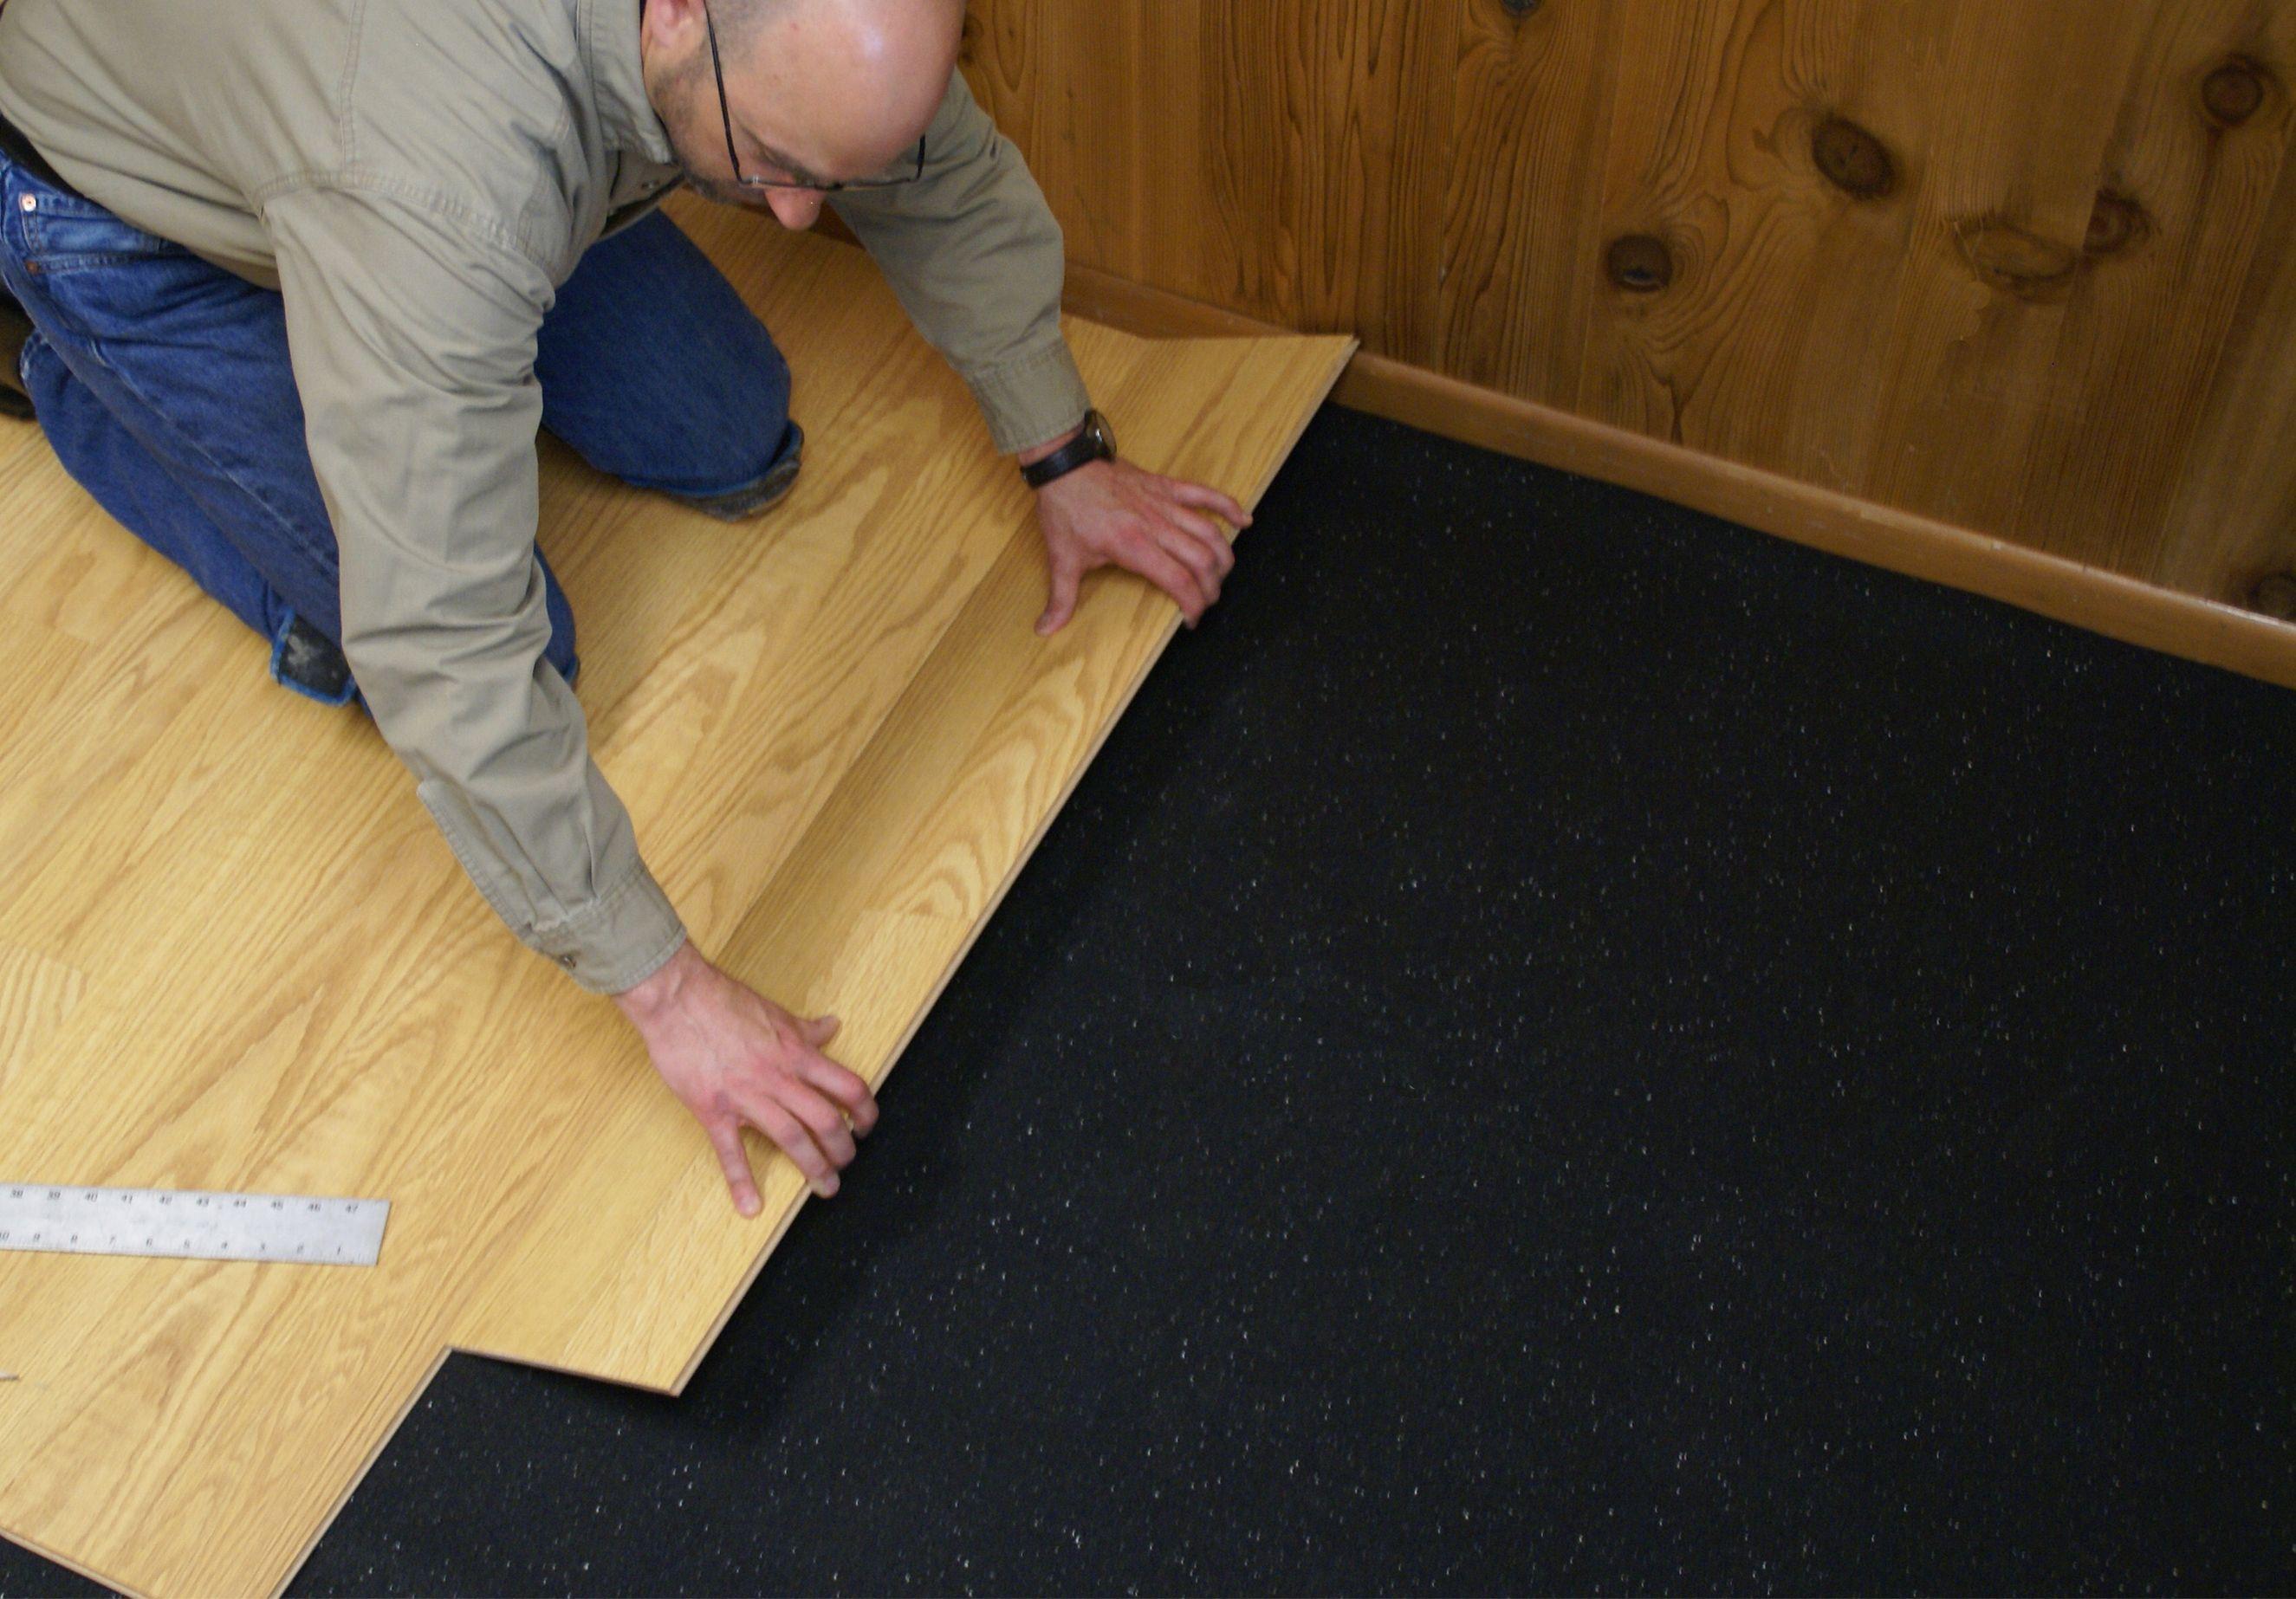 Hardwood Floor Underlayment Moisture Barrier Underlay For Laminate Flooring Engineered Wood Floors Flooring Underlayment